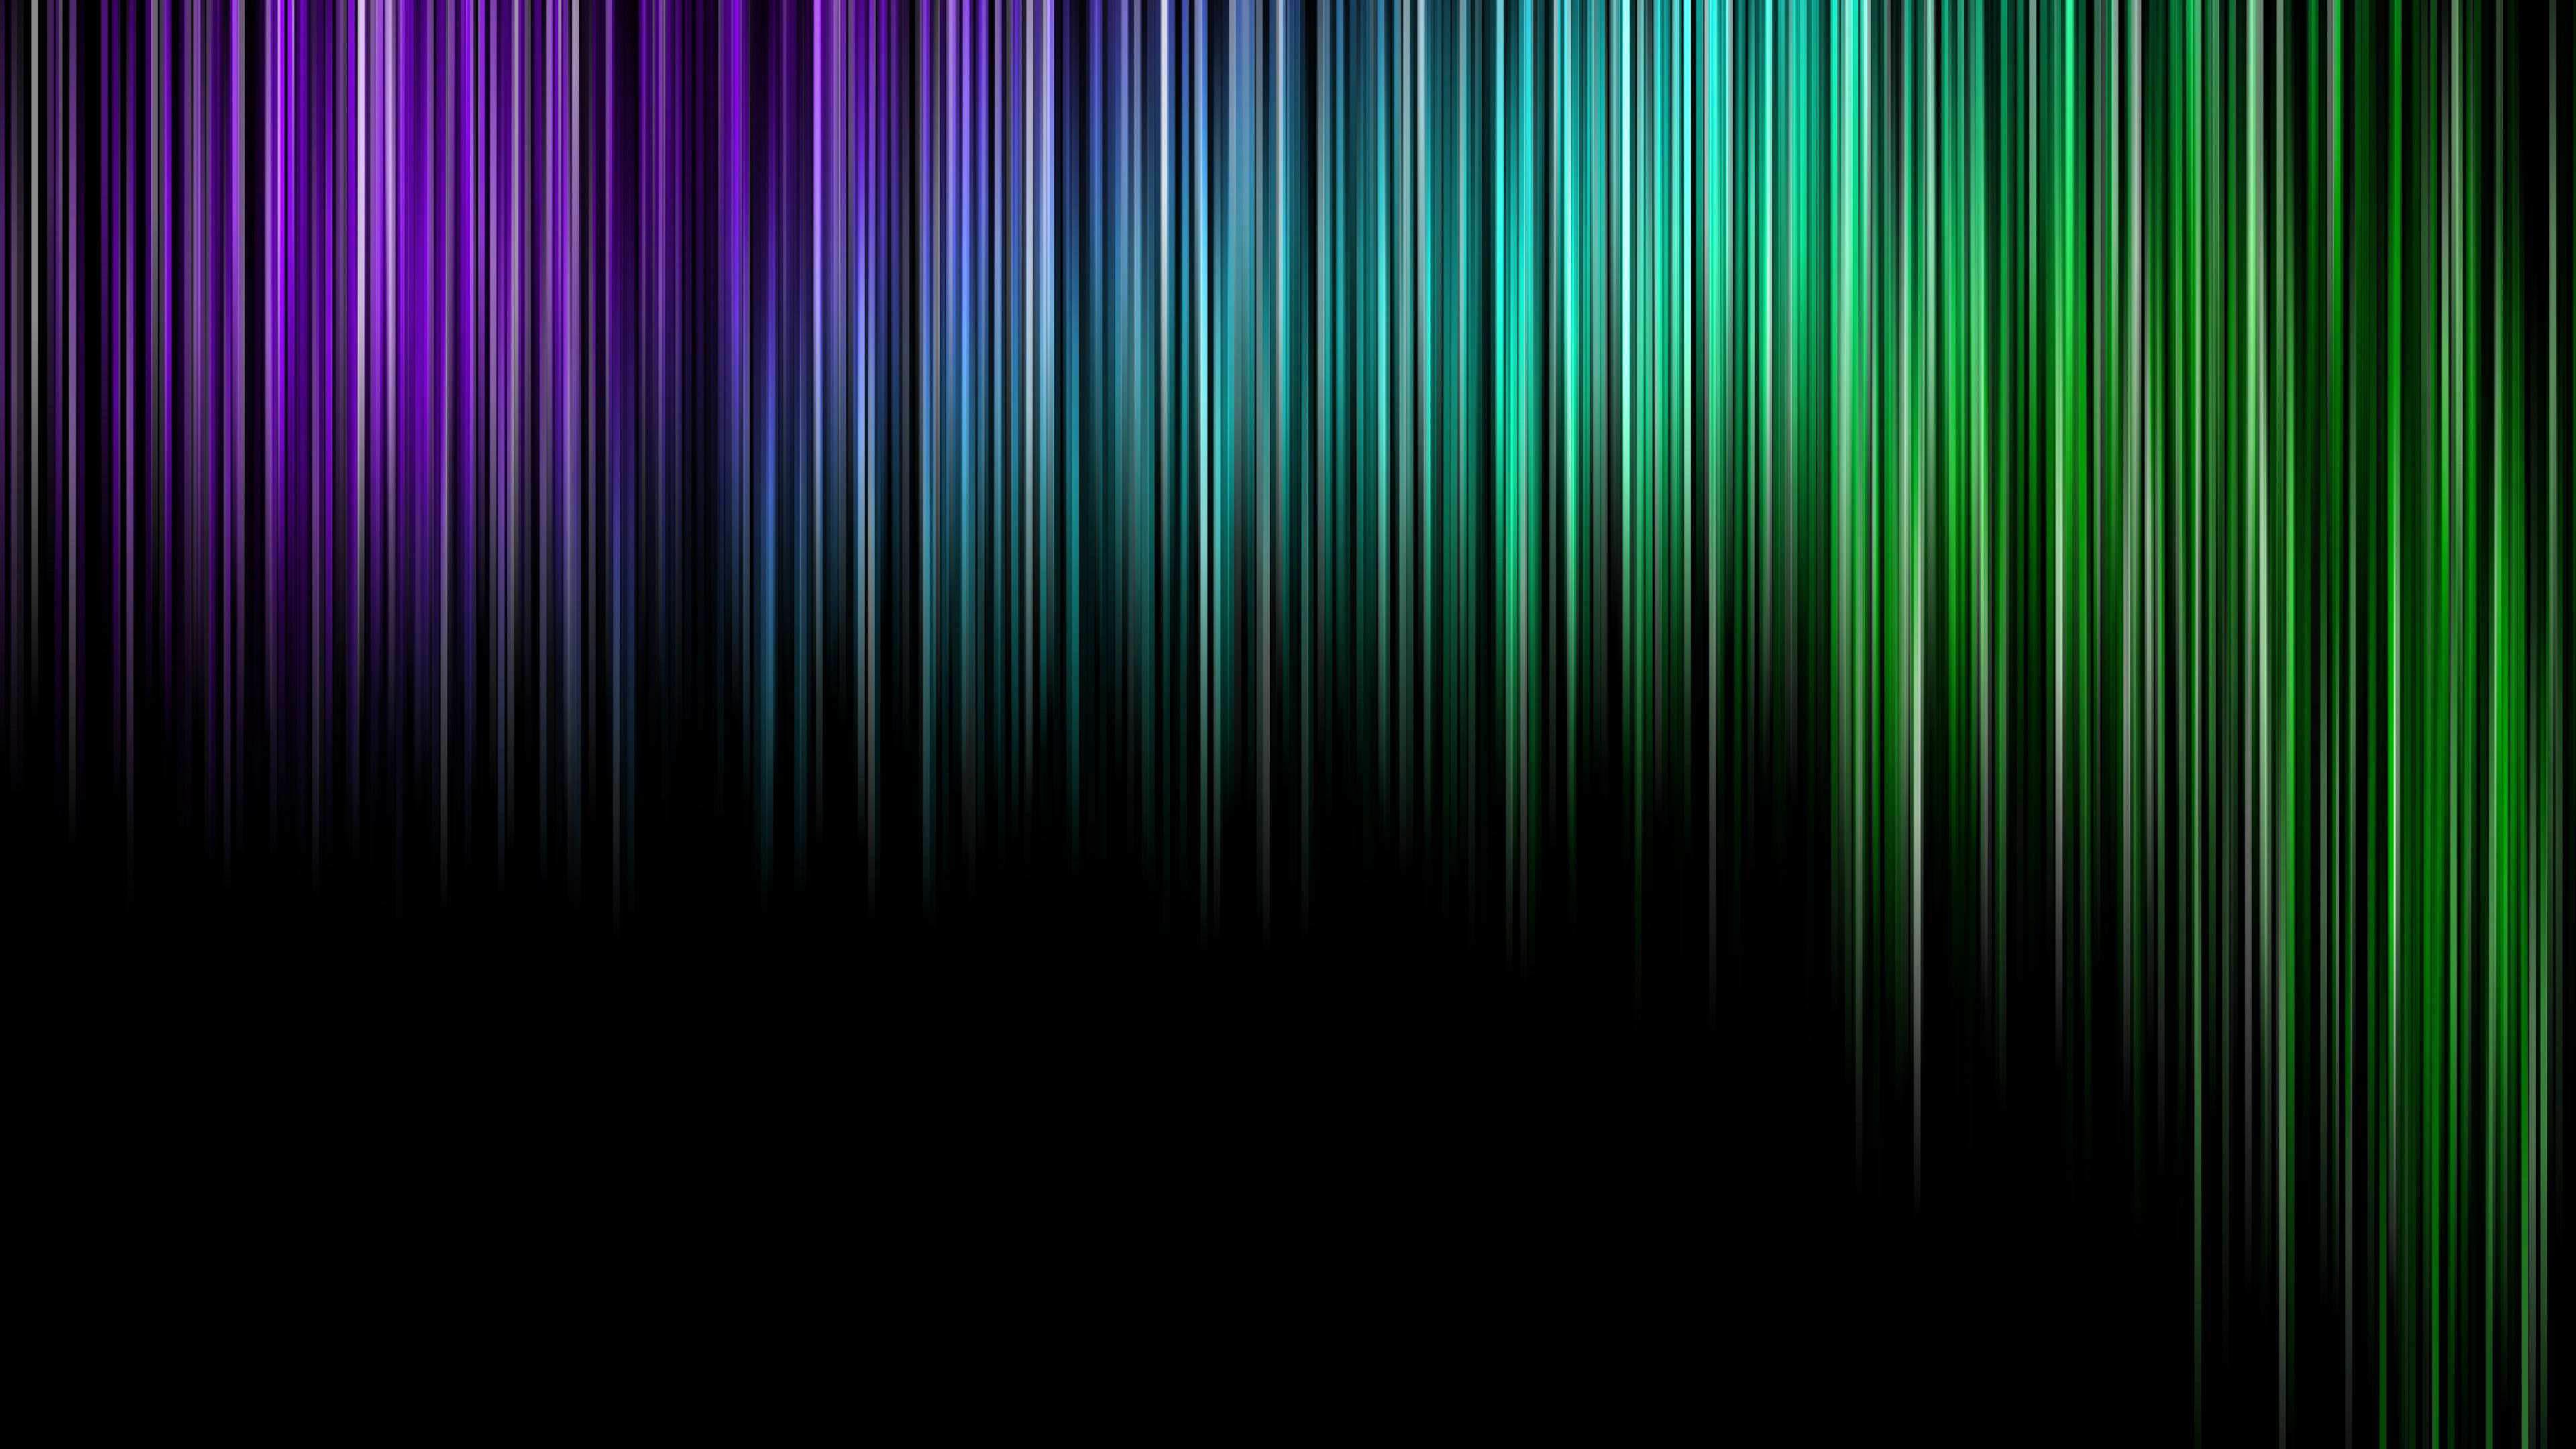 Purple to Green Digital Rain wallpaper